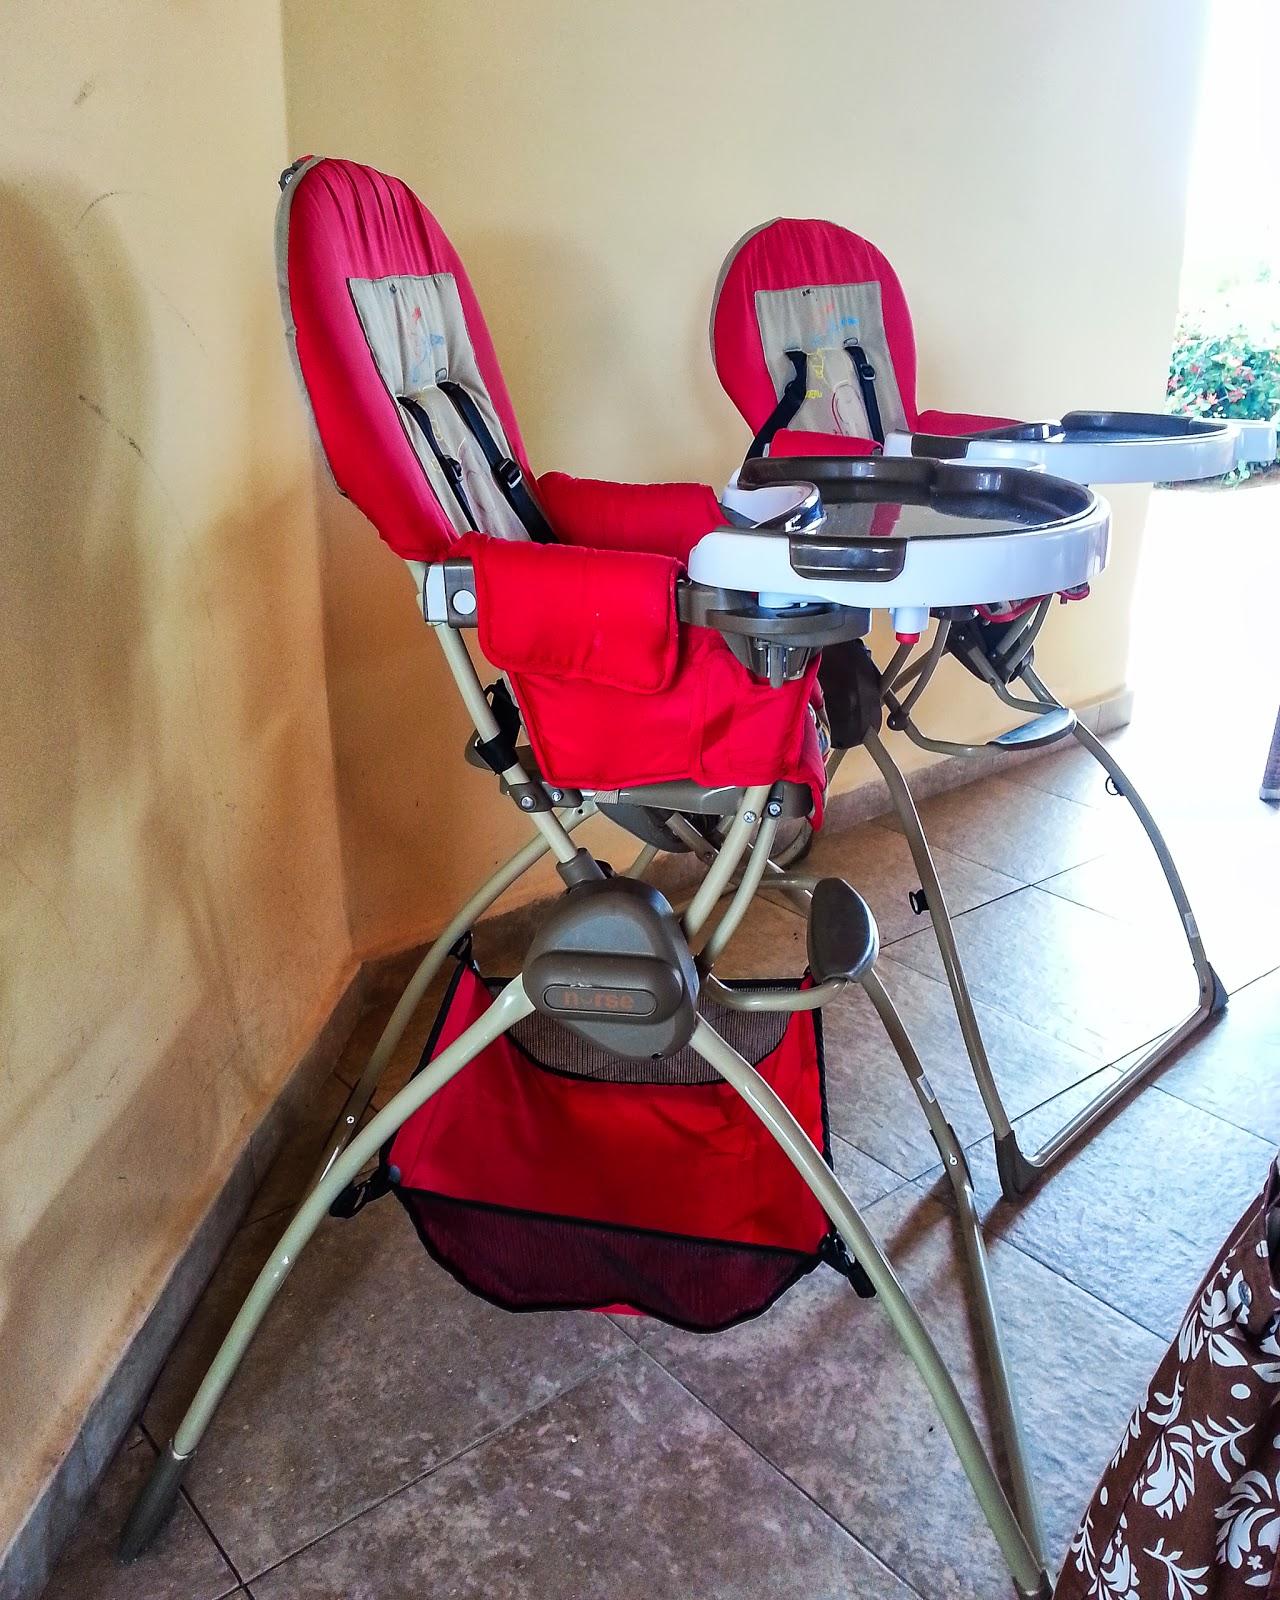 cream puff chair cow hide chairs family trip to cuba 2013 memories flamenco resort cayo